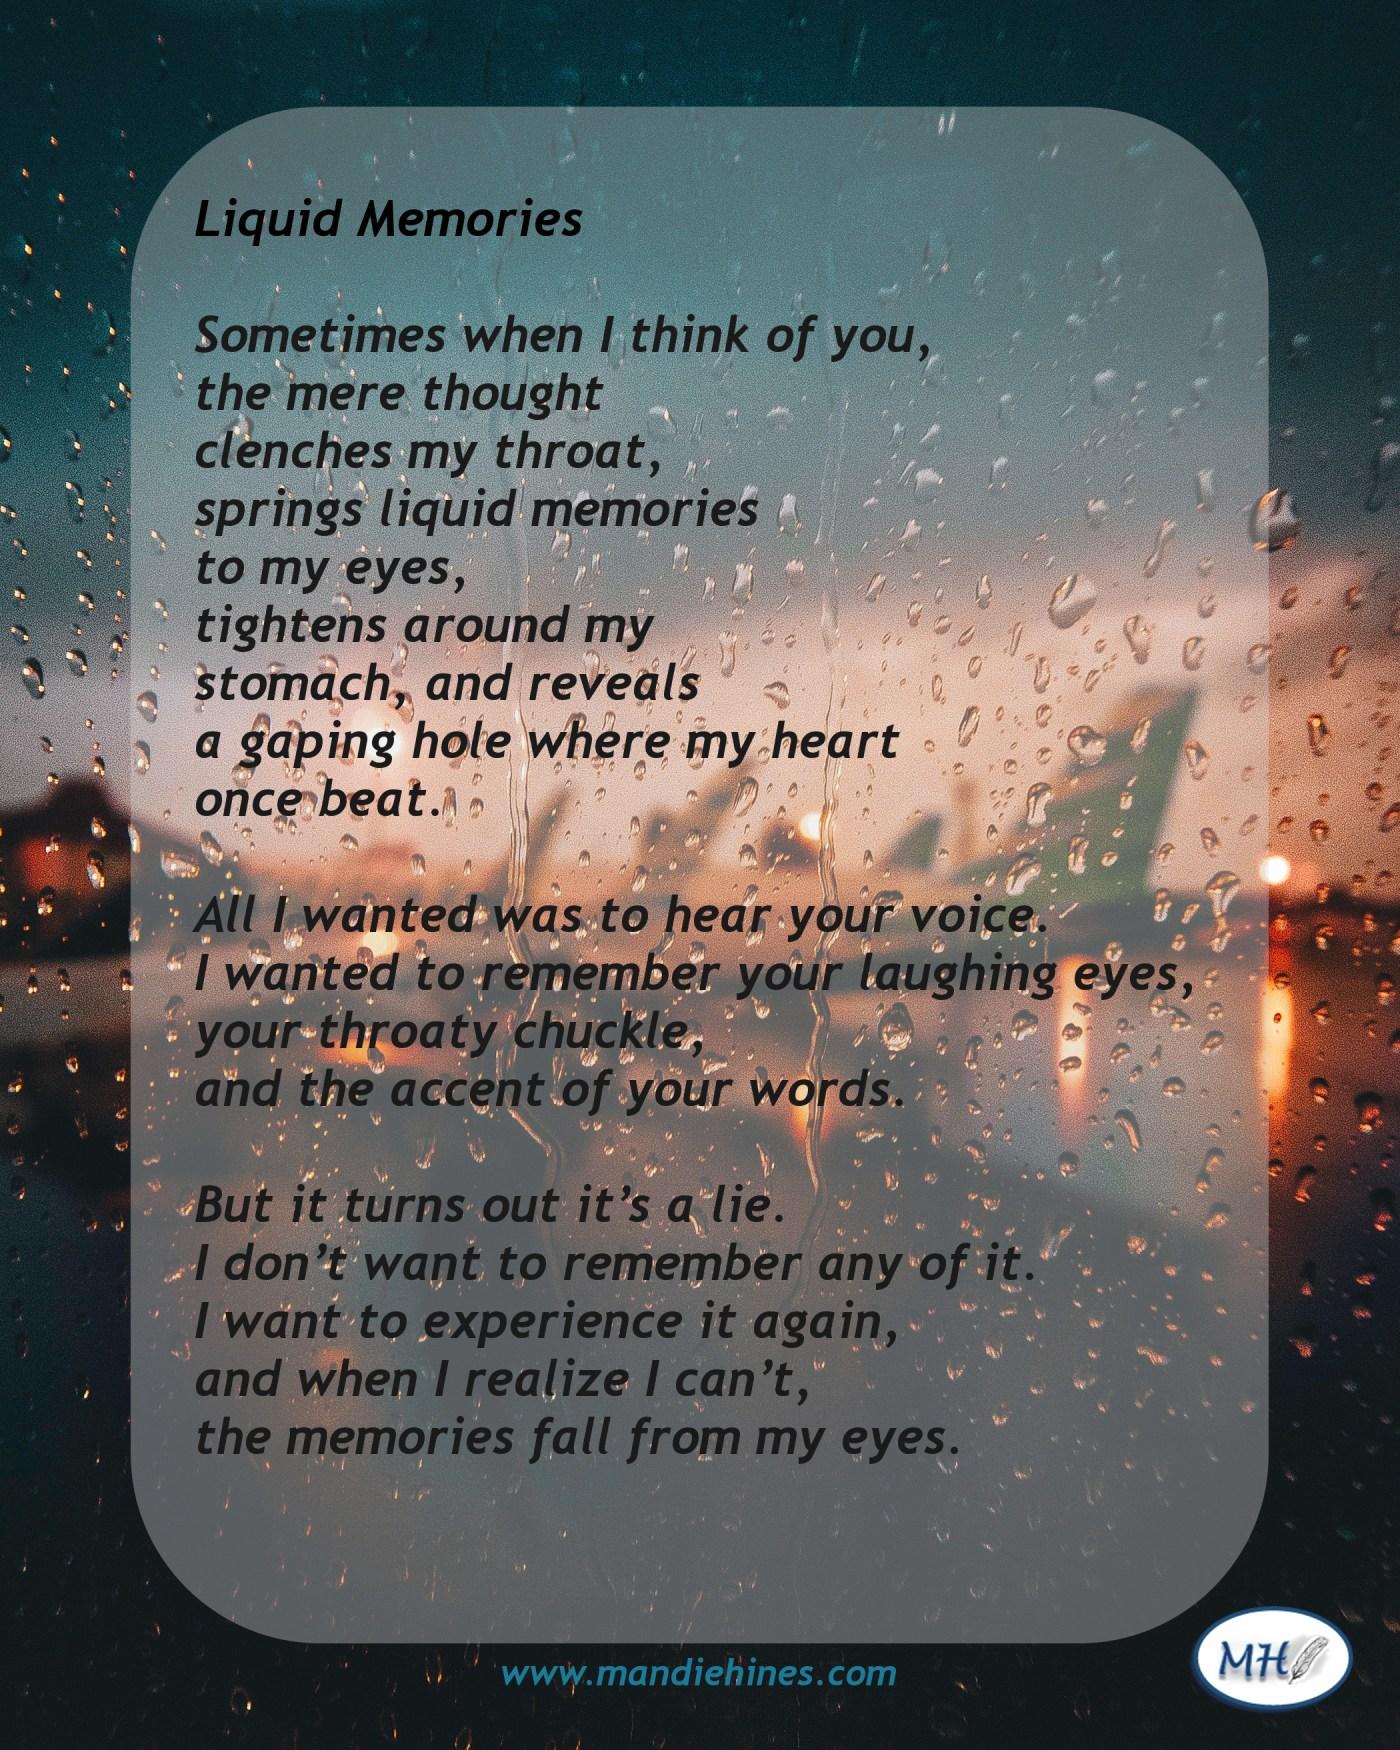 Images of memories